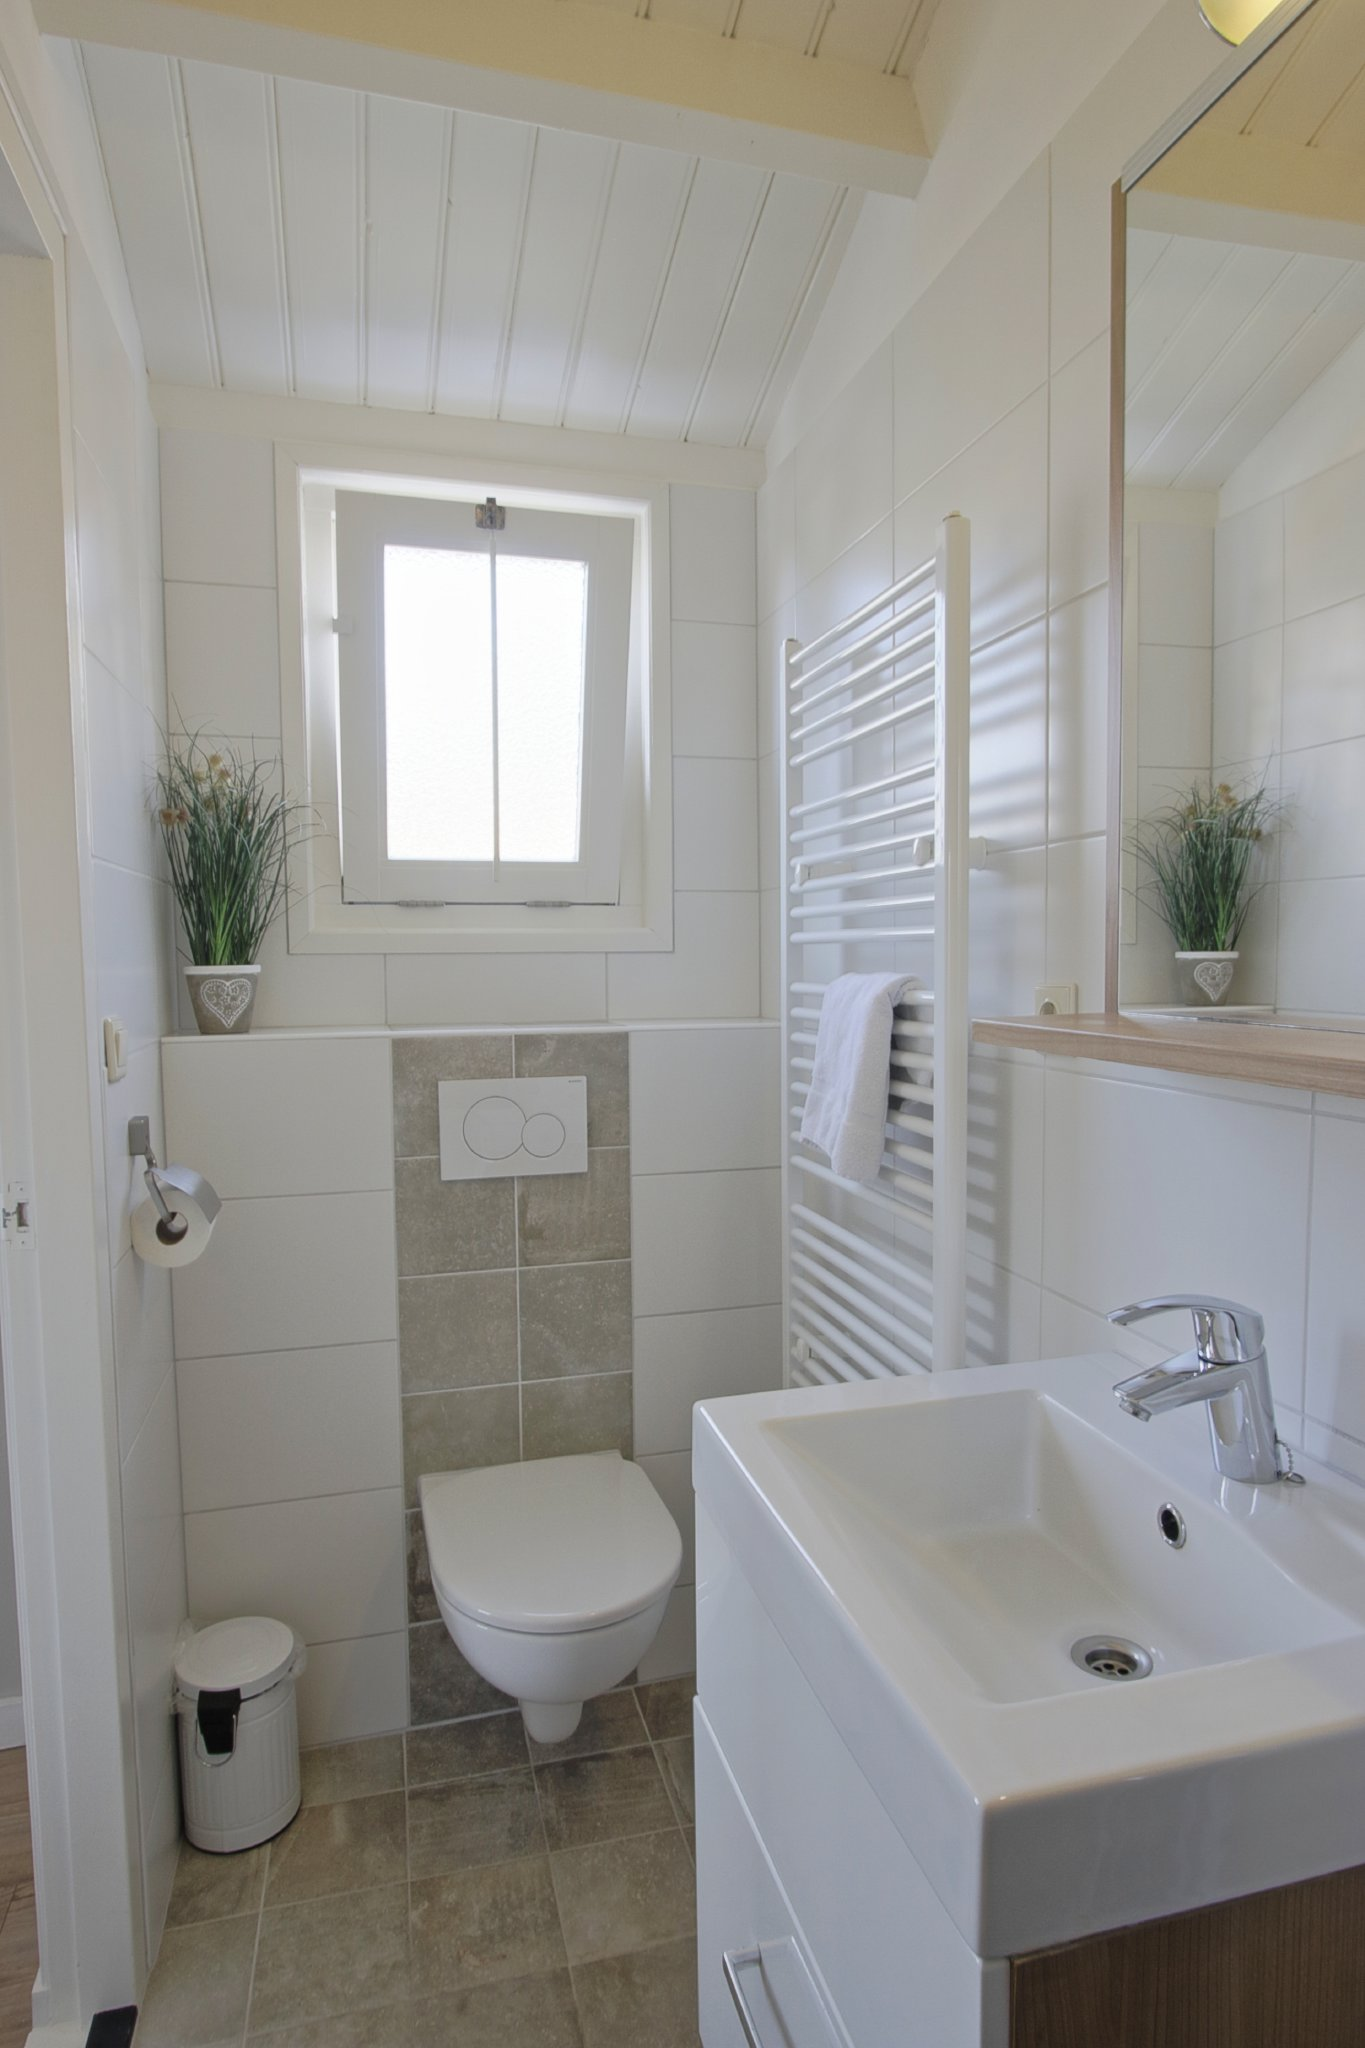 Douche und Toilette